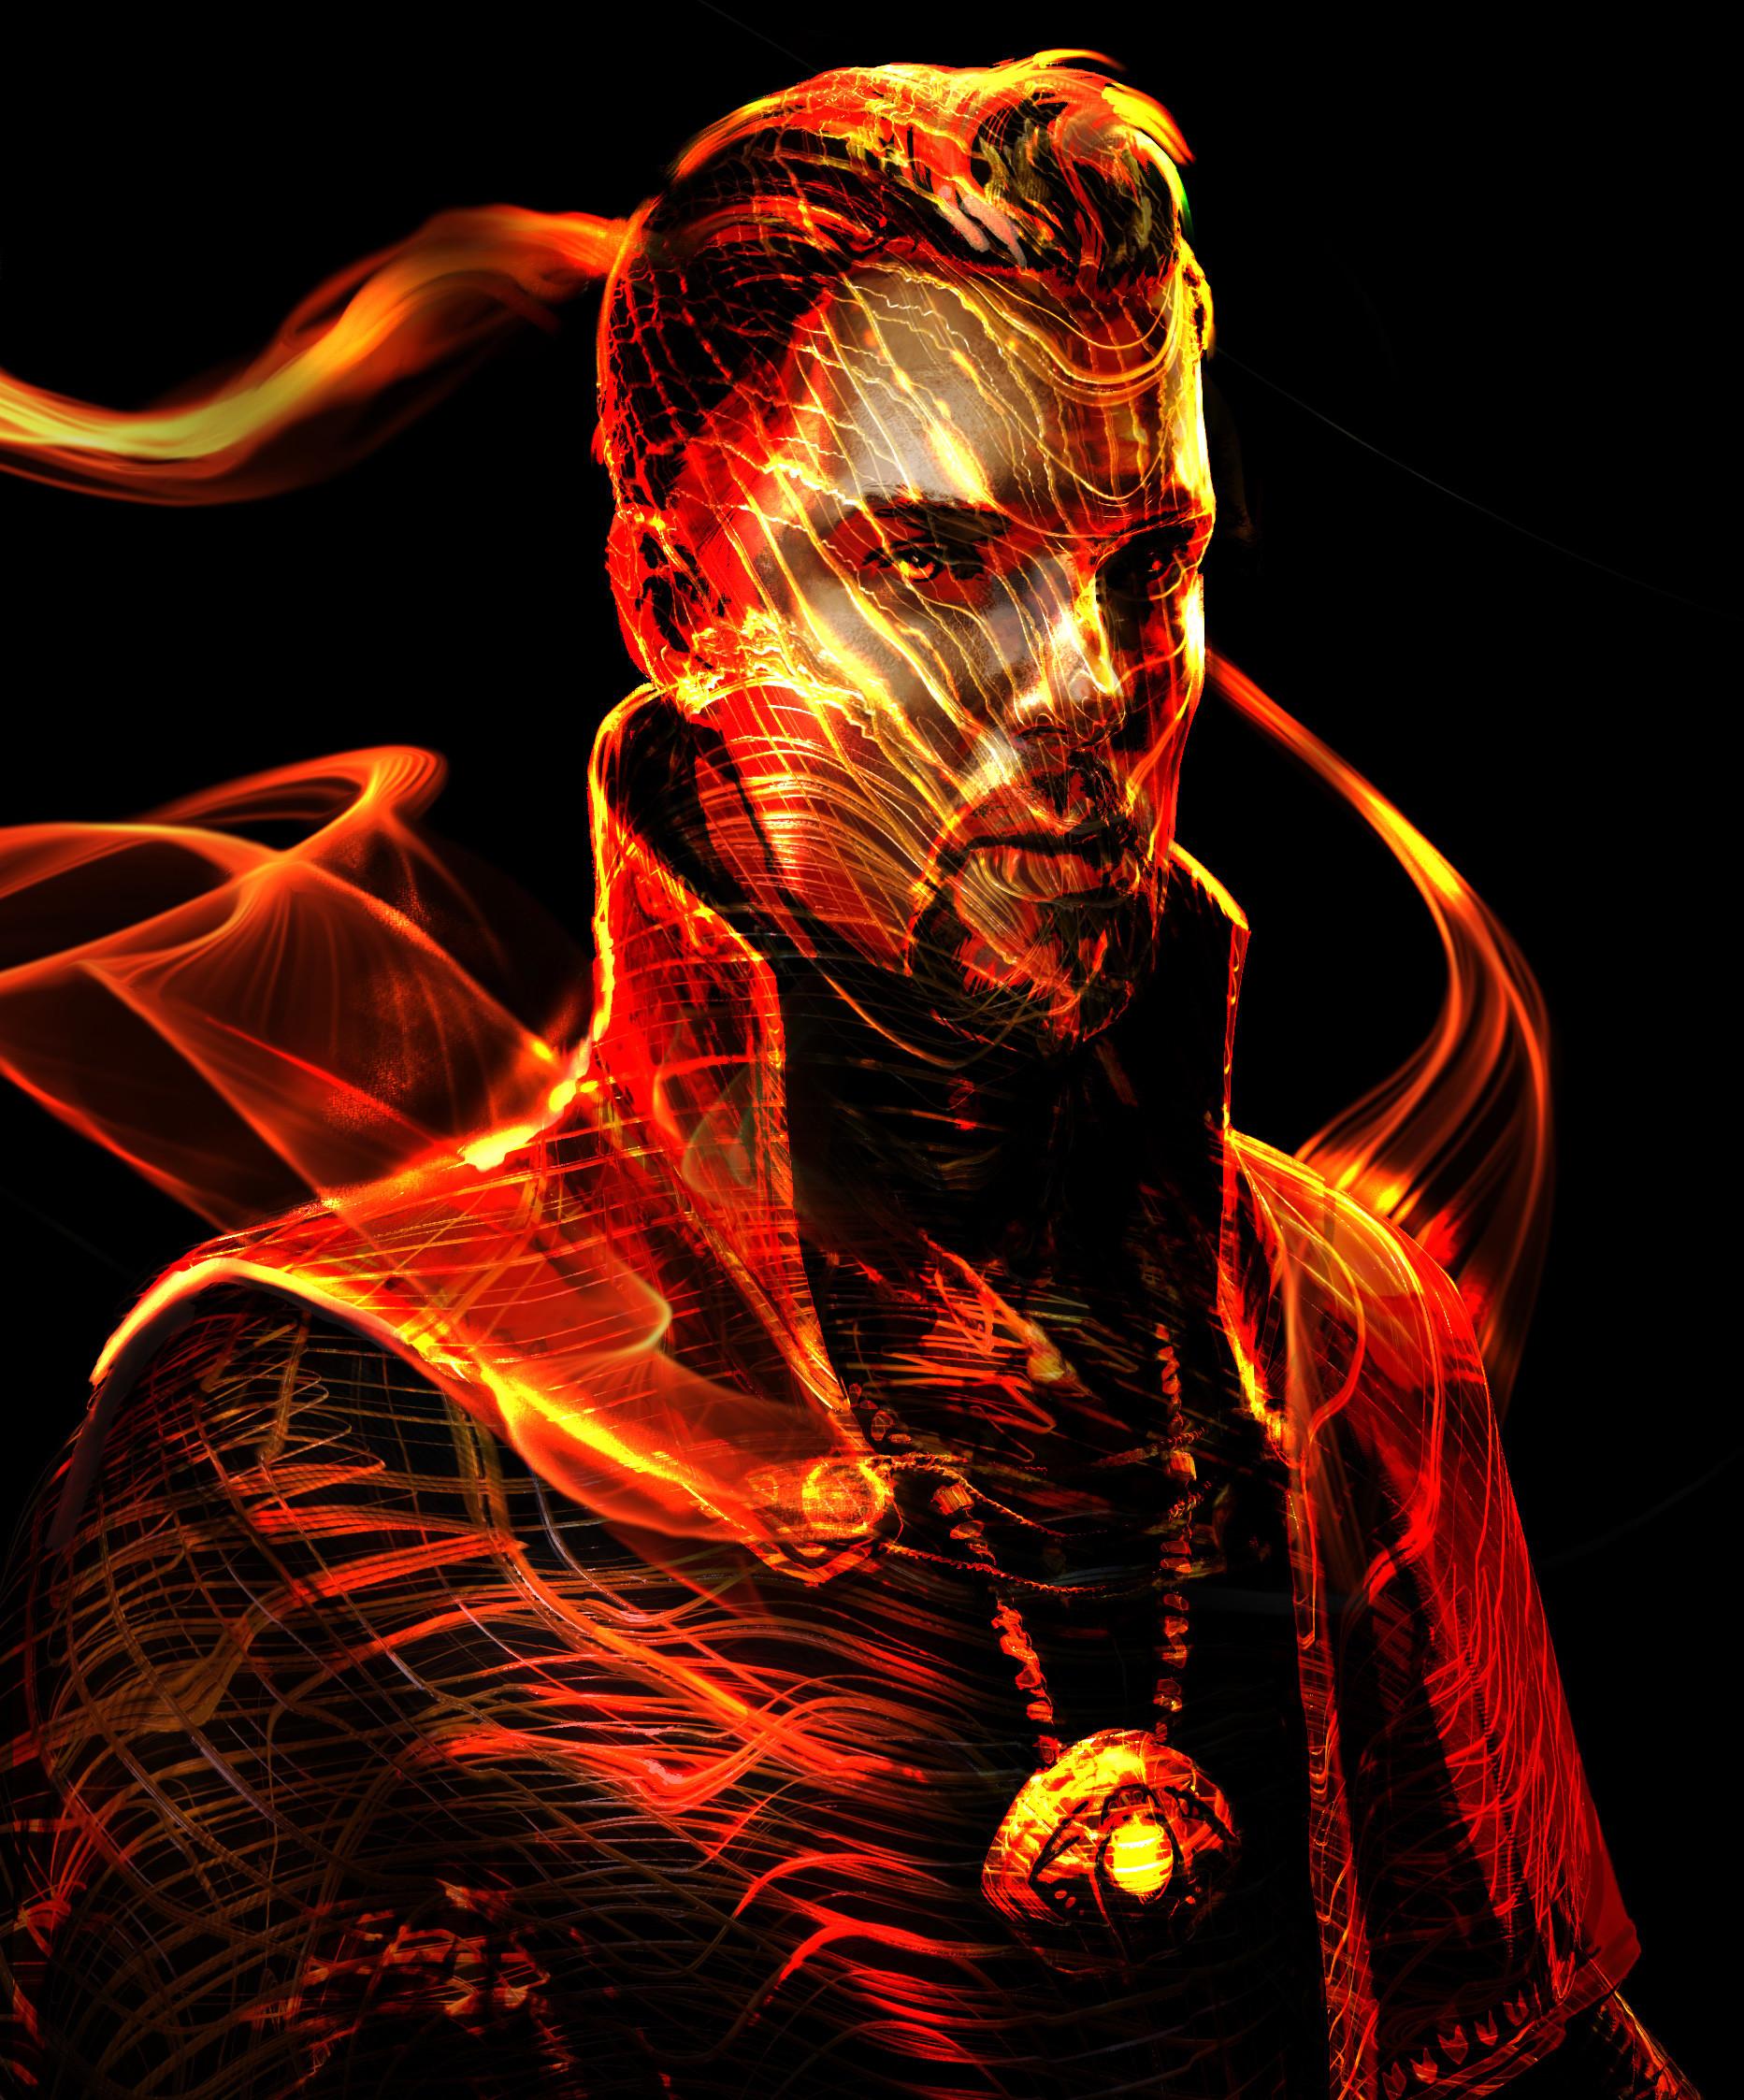 Doctor Strange Concept Art by Jerad Marantz